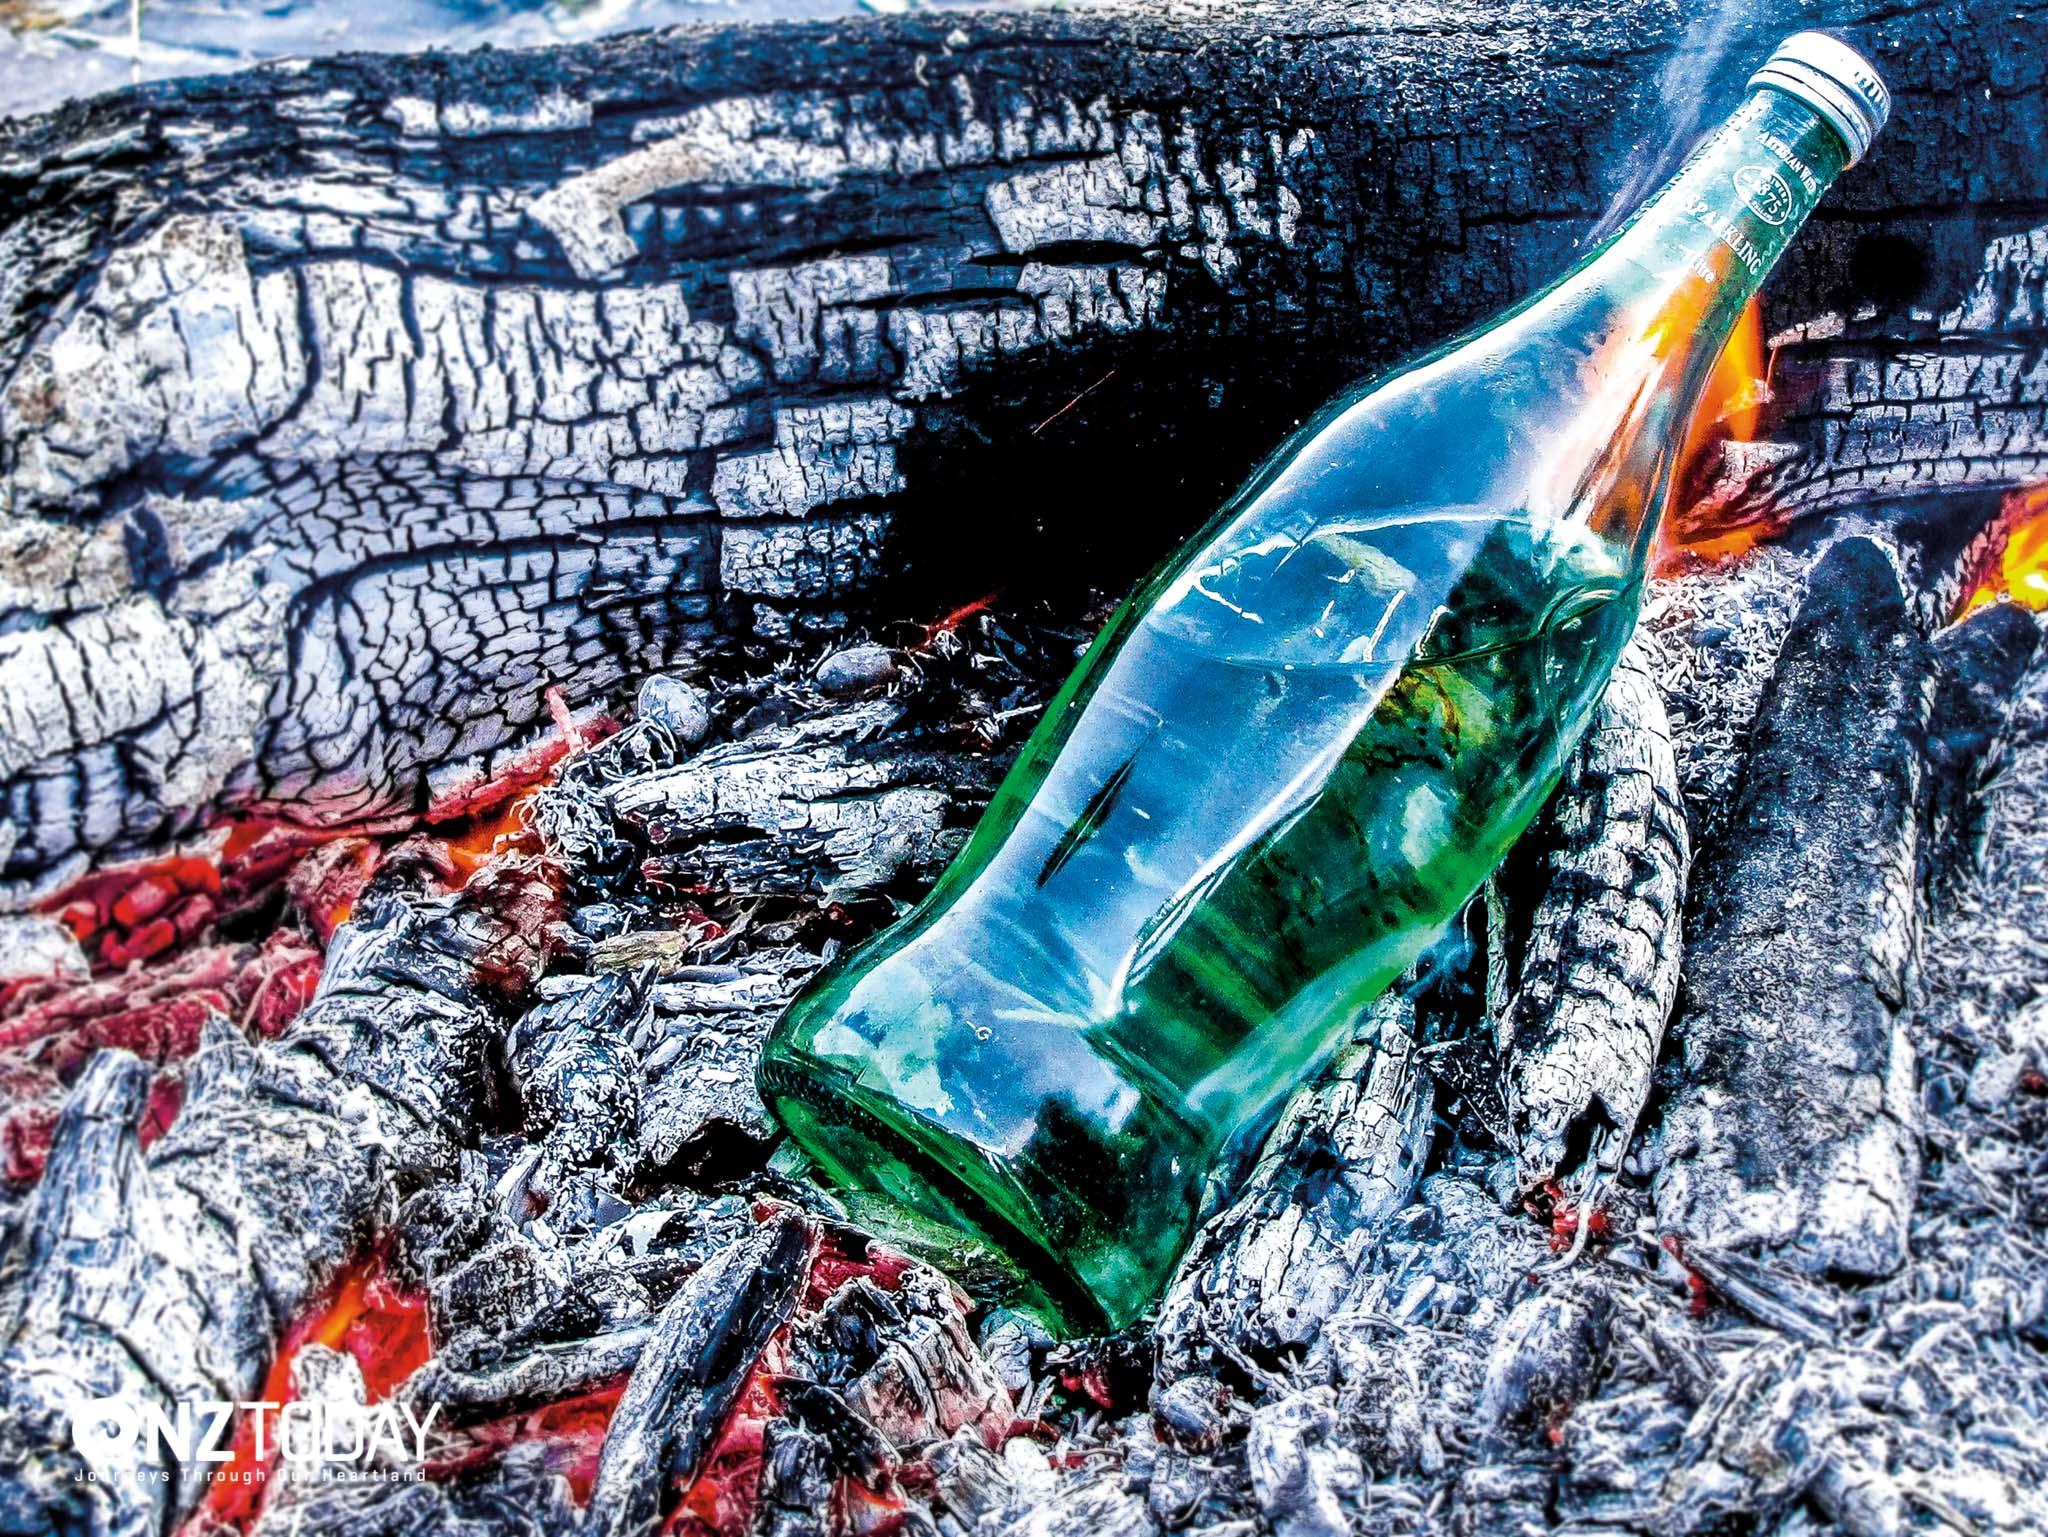 Waters Of New Zealand Inside The Bottle